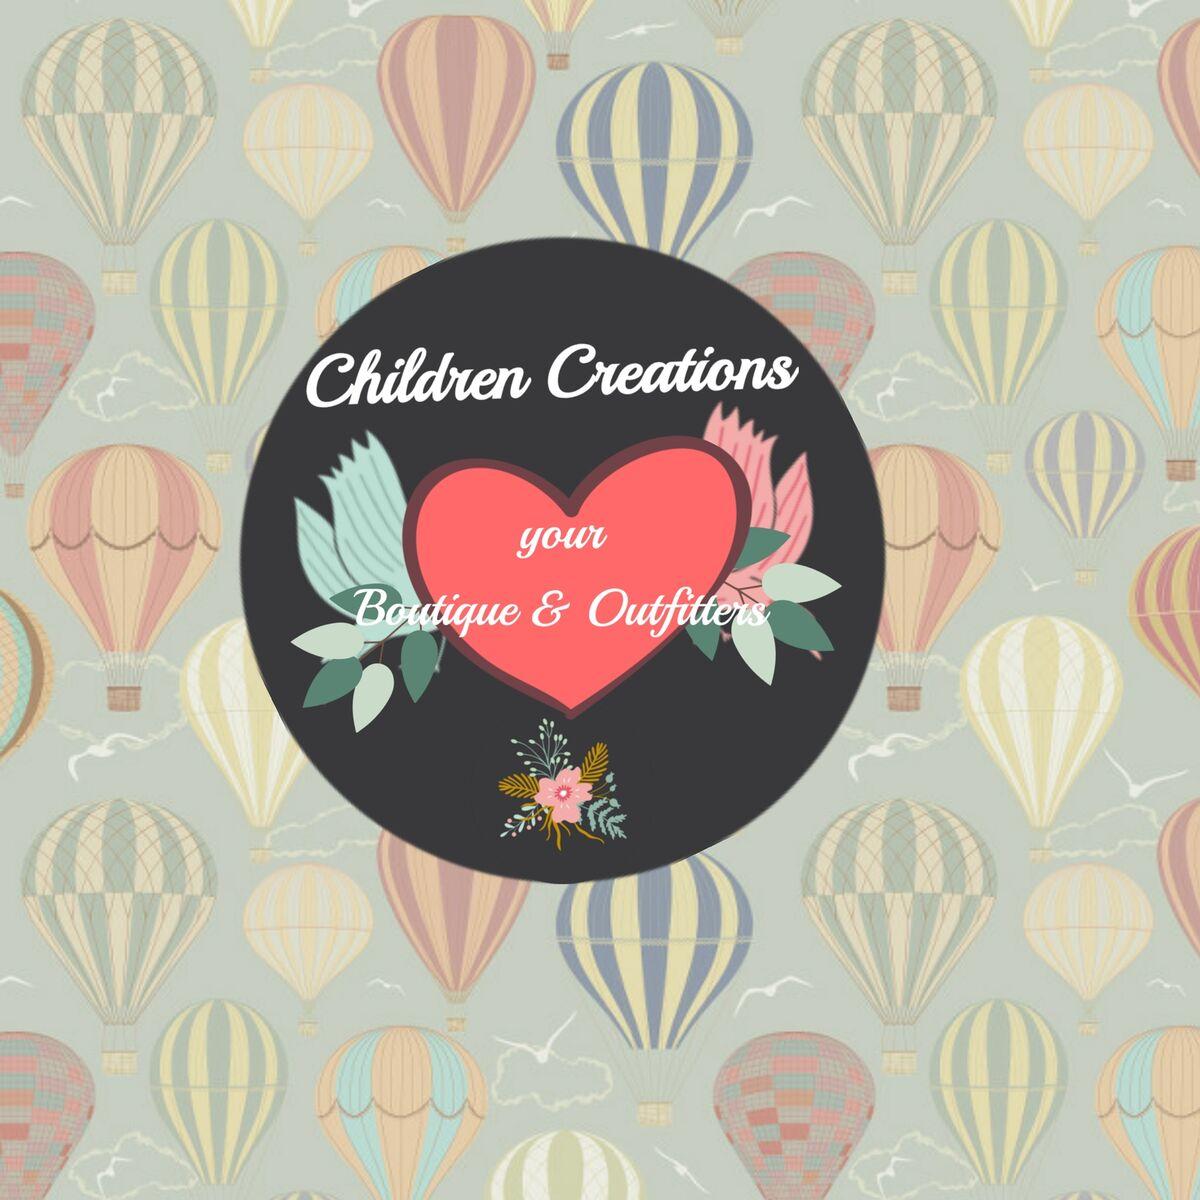 ChildrensCreations